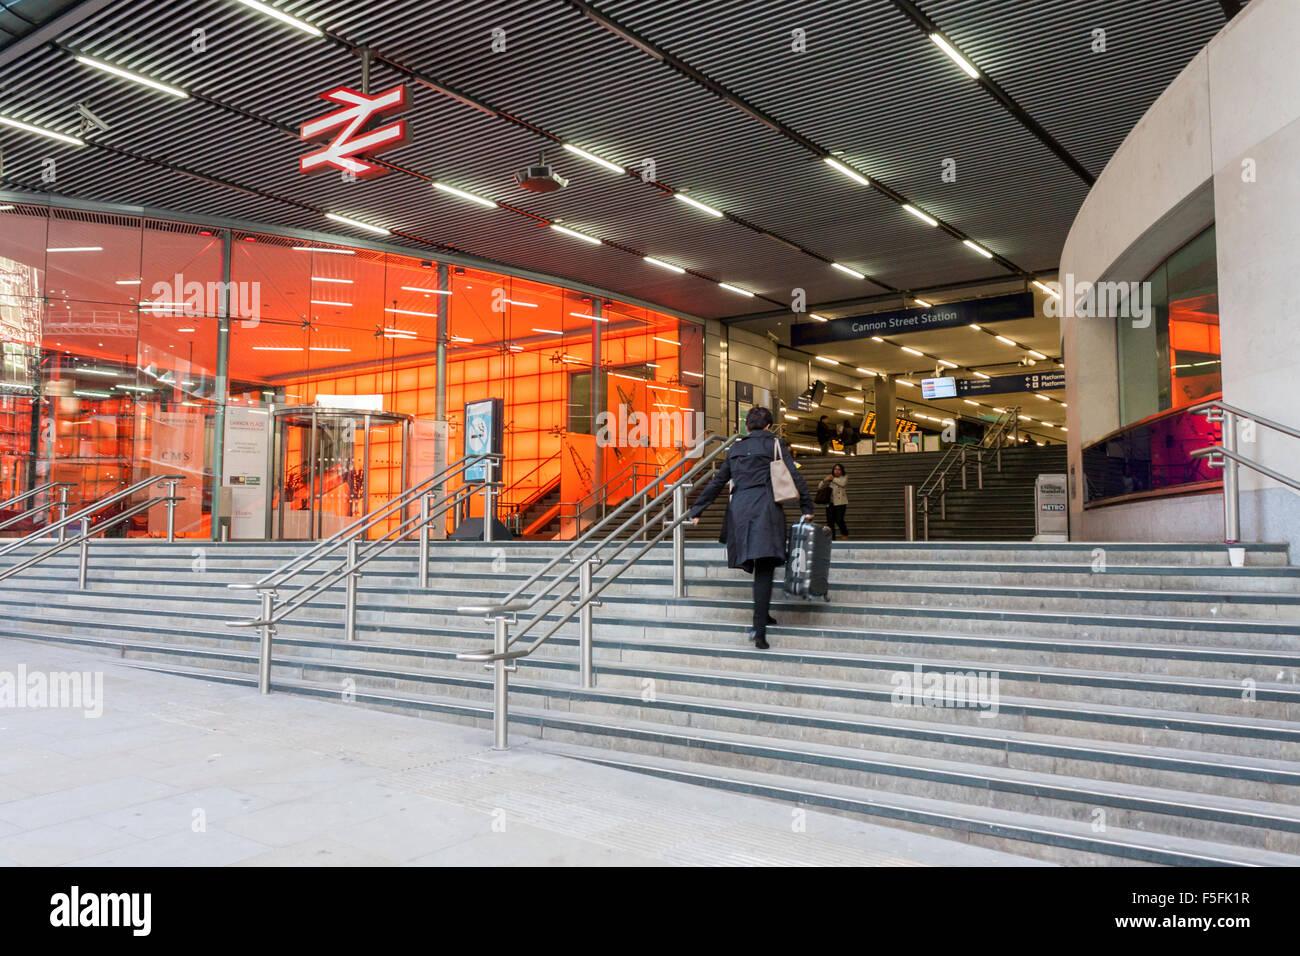 Entrance to Cannon Street tube and railway station , London, England, GB, UK. - Stock Image